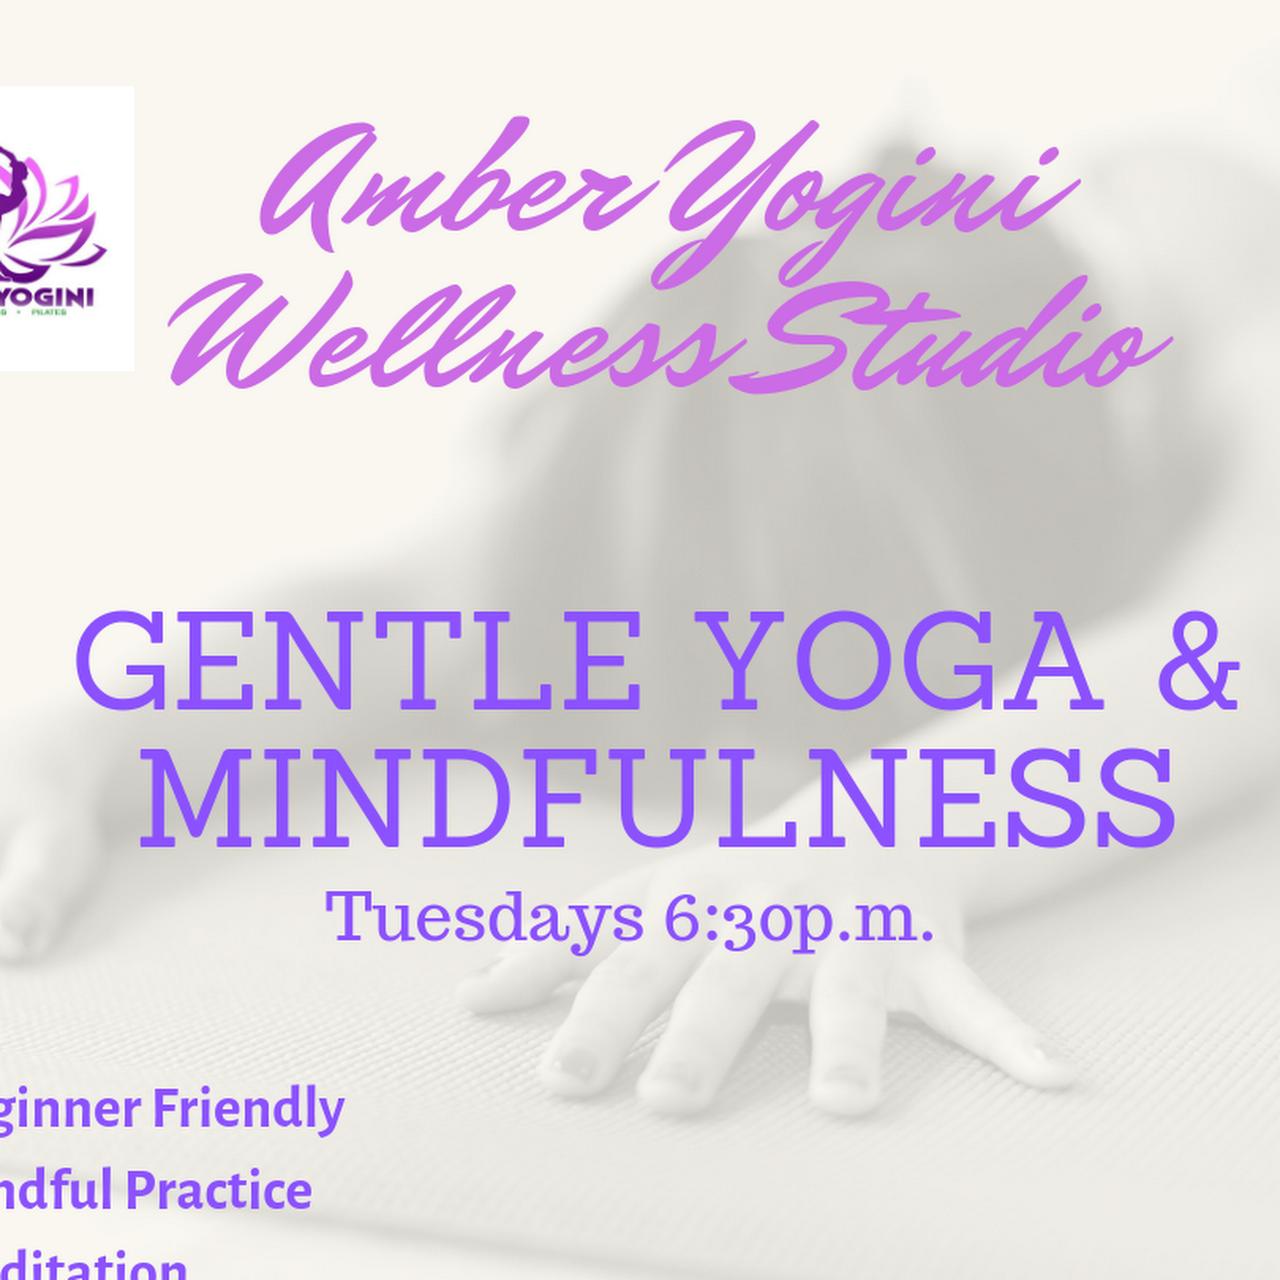 Amber Yogini Wellness Studio - Vinyasa Yoga Studio in Charlieville